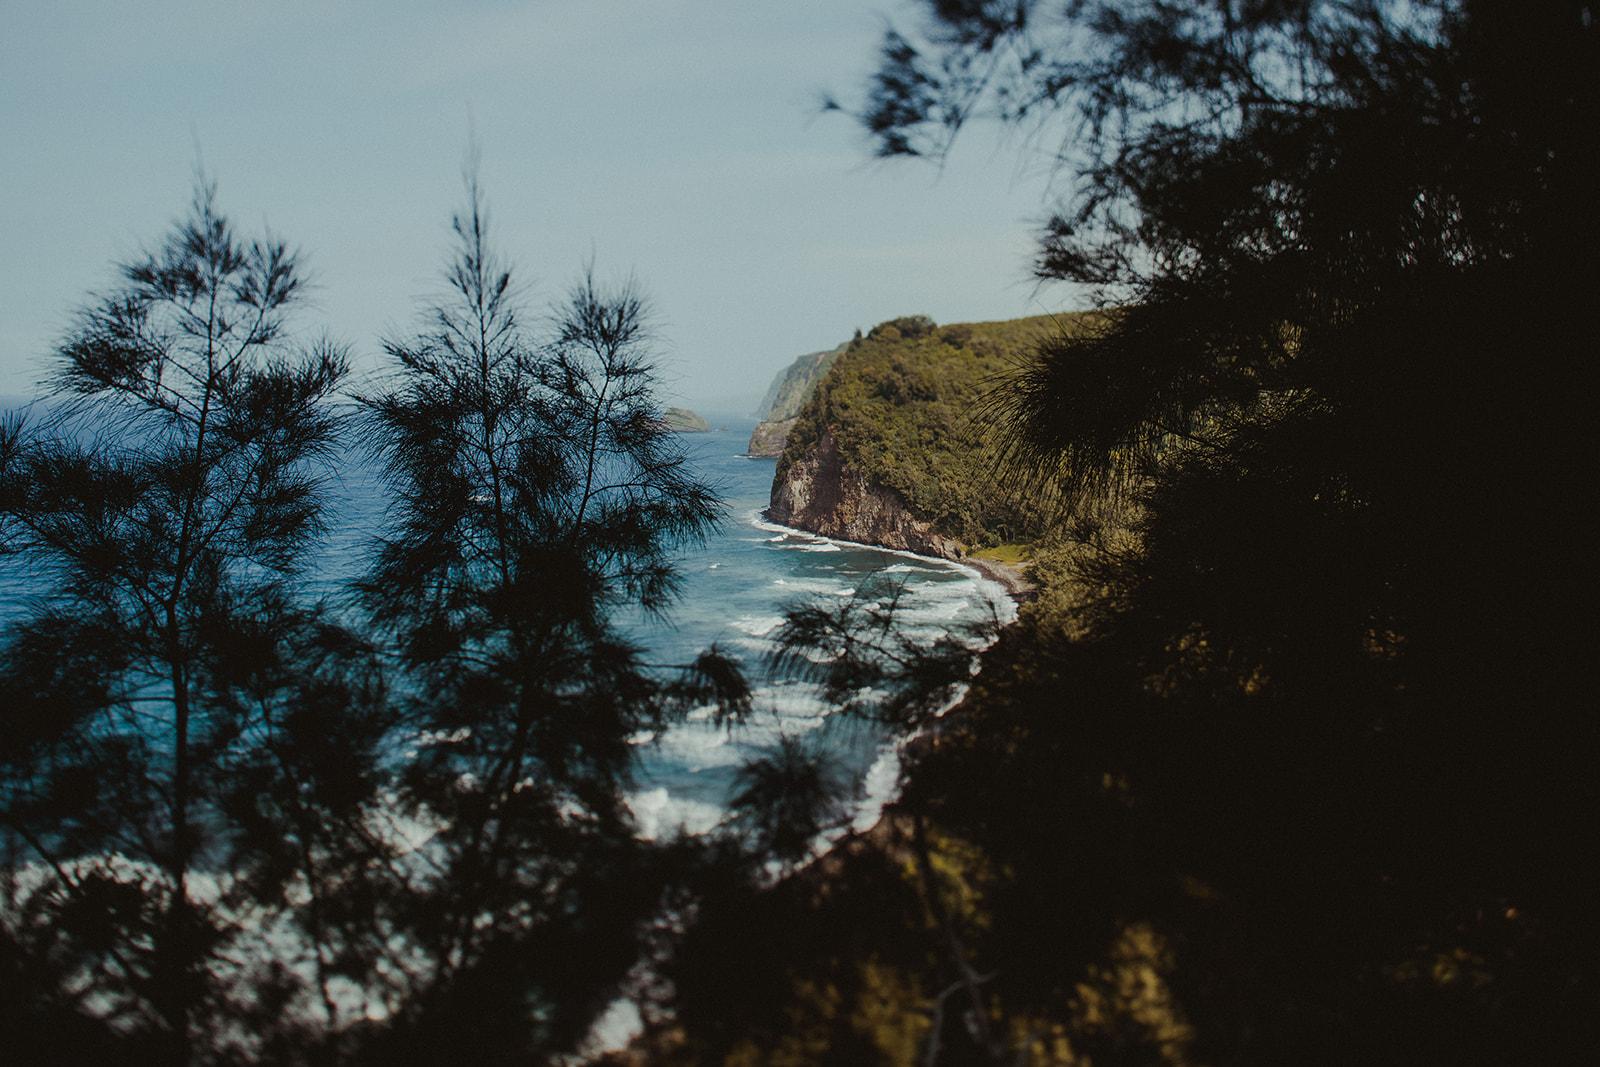 elope in hawaii